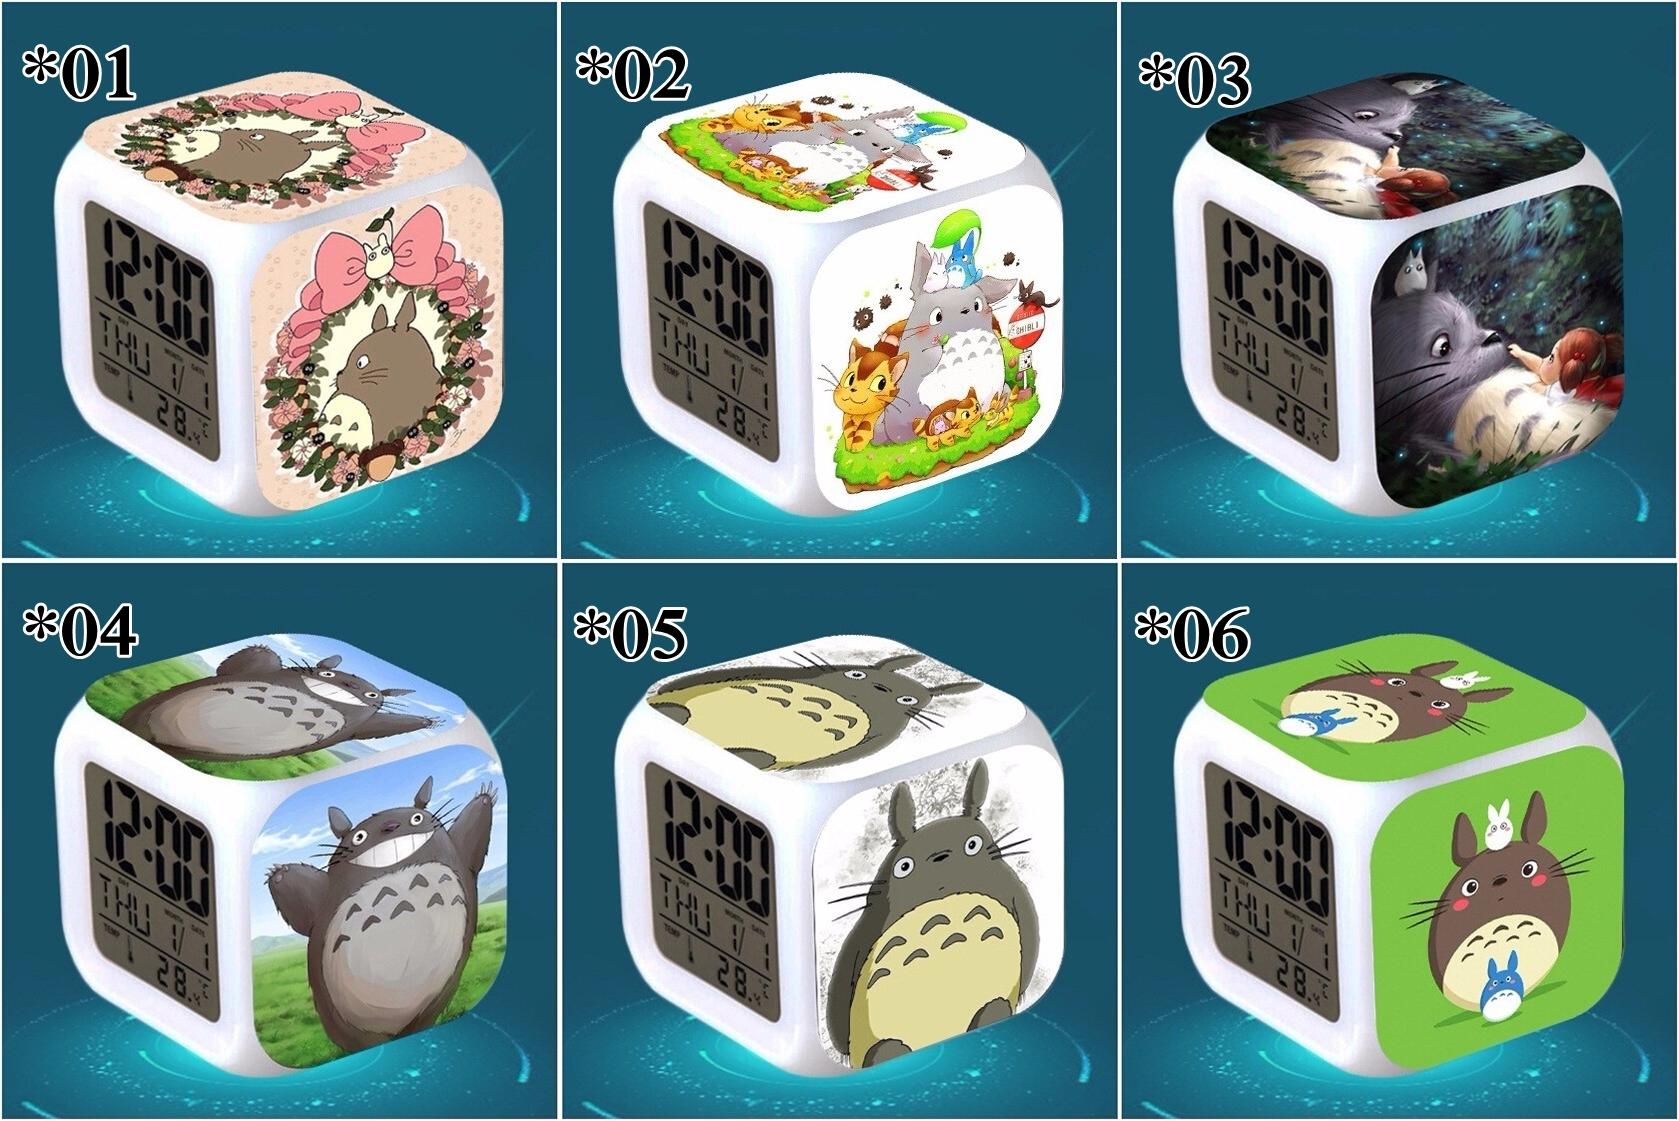 Relojes digitales Totoro *01